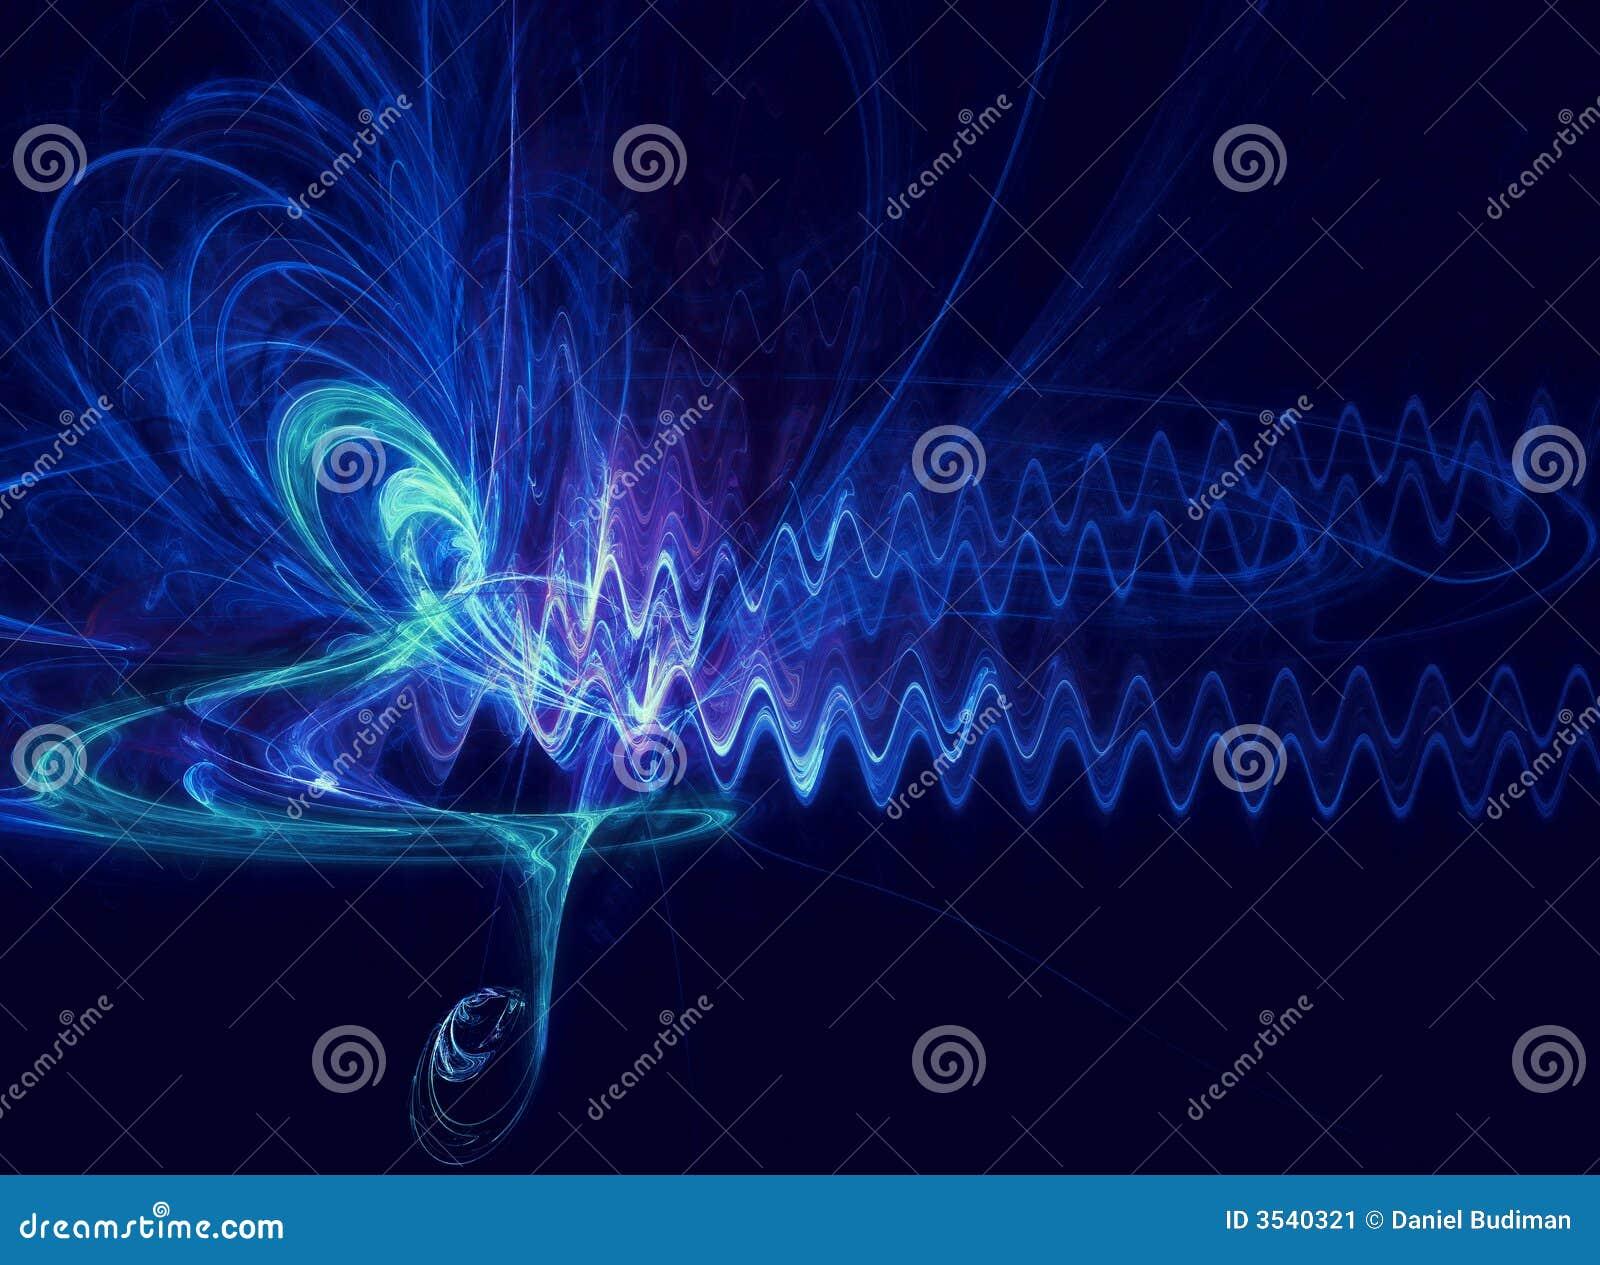 Soundwave abstrakcyjne